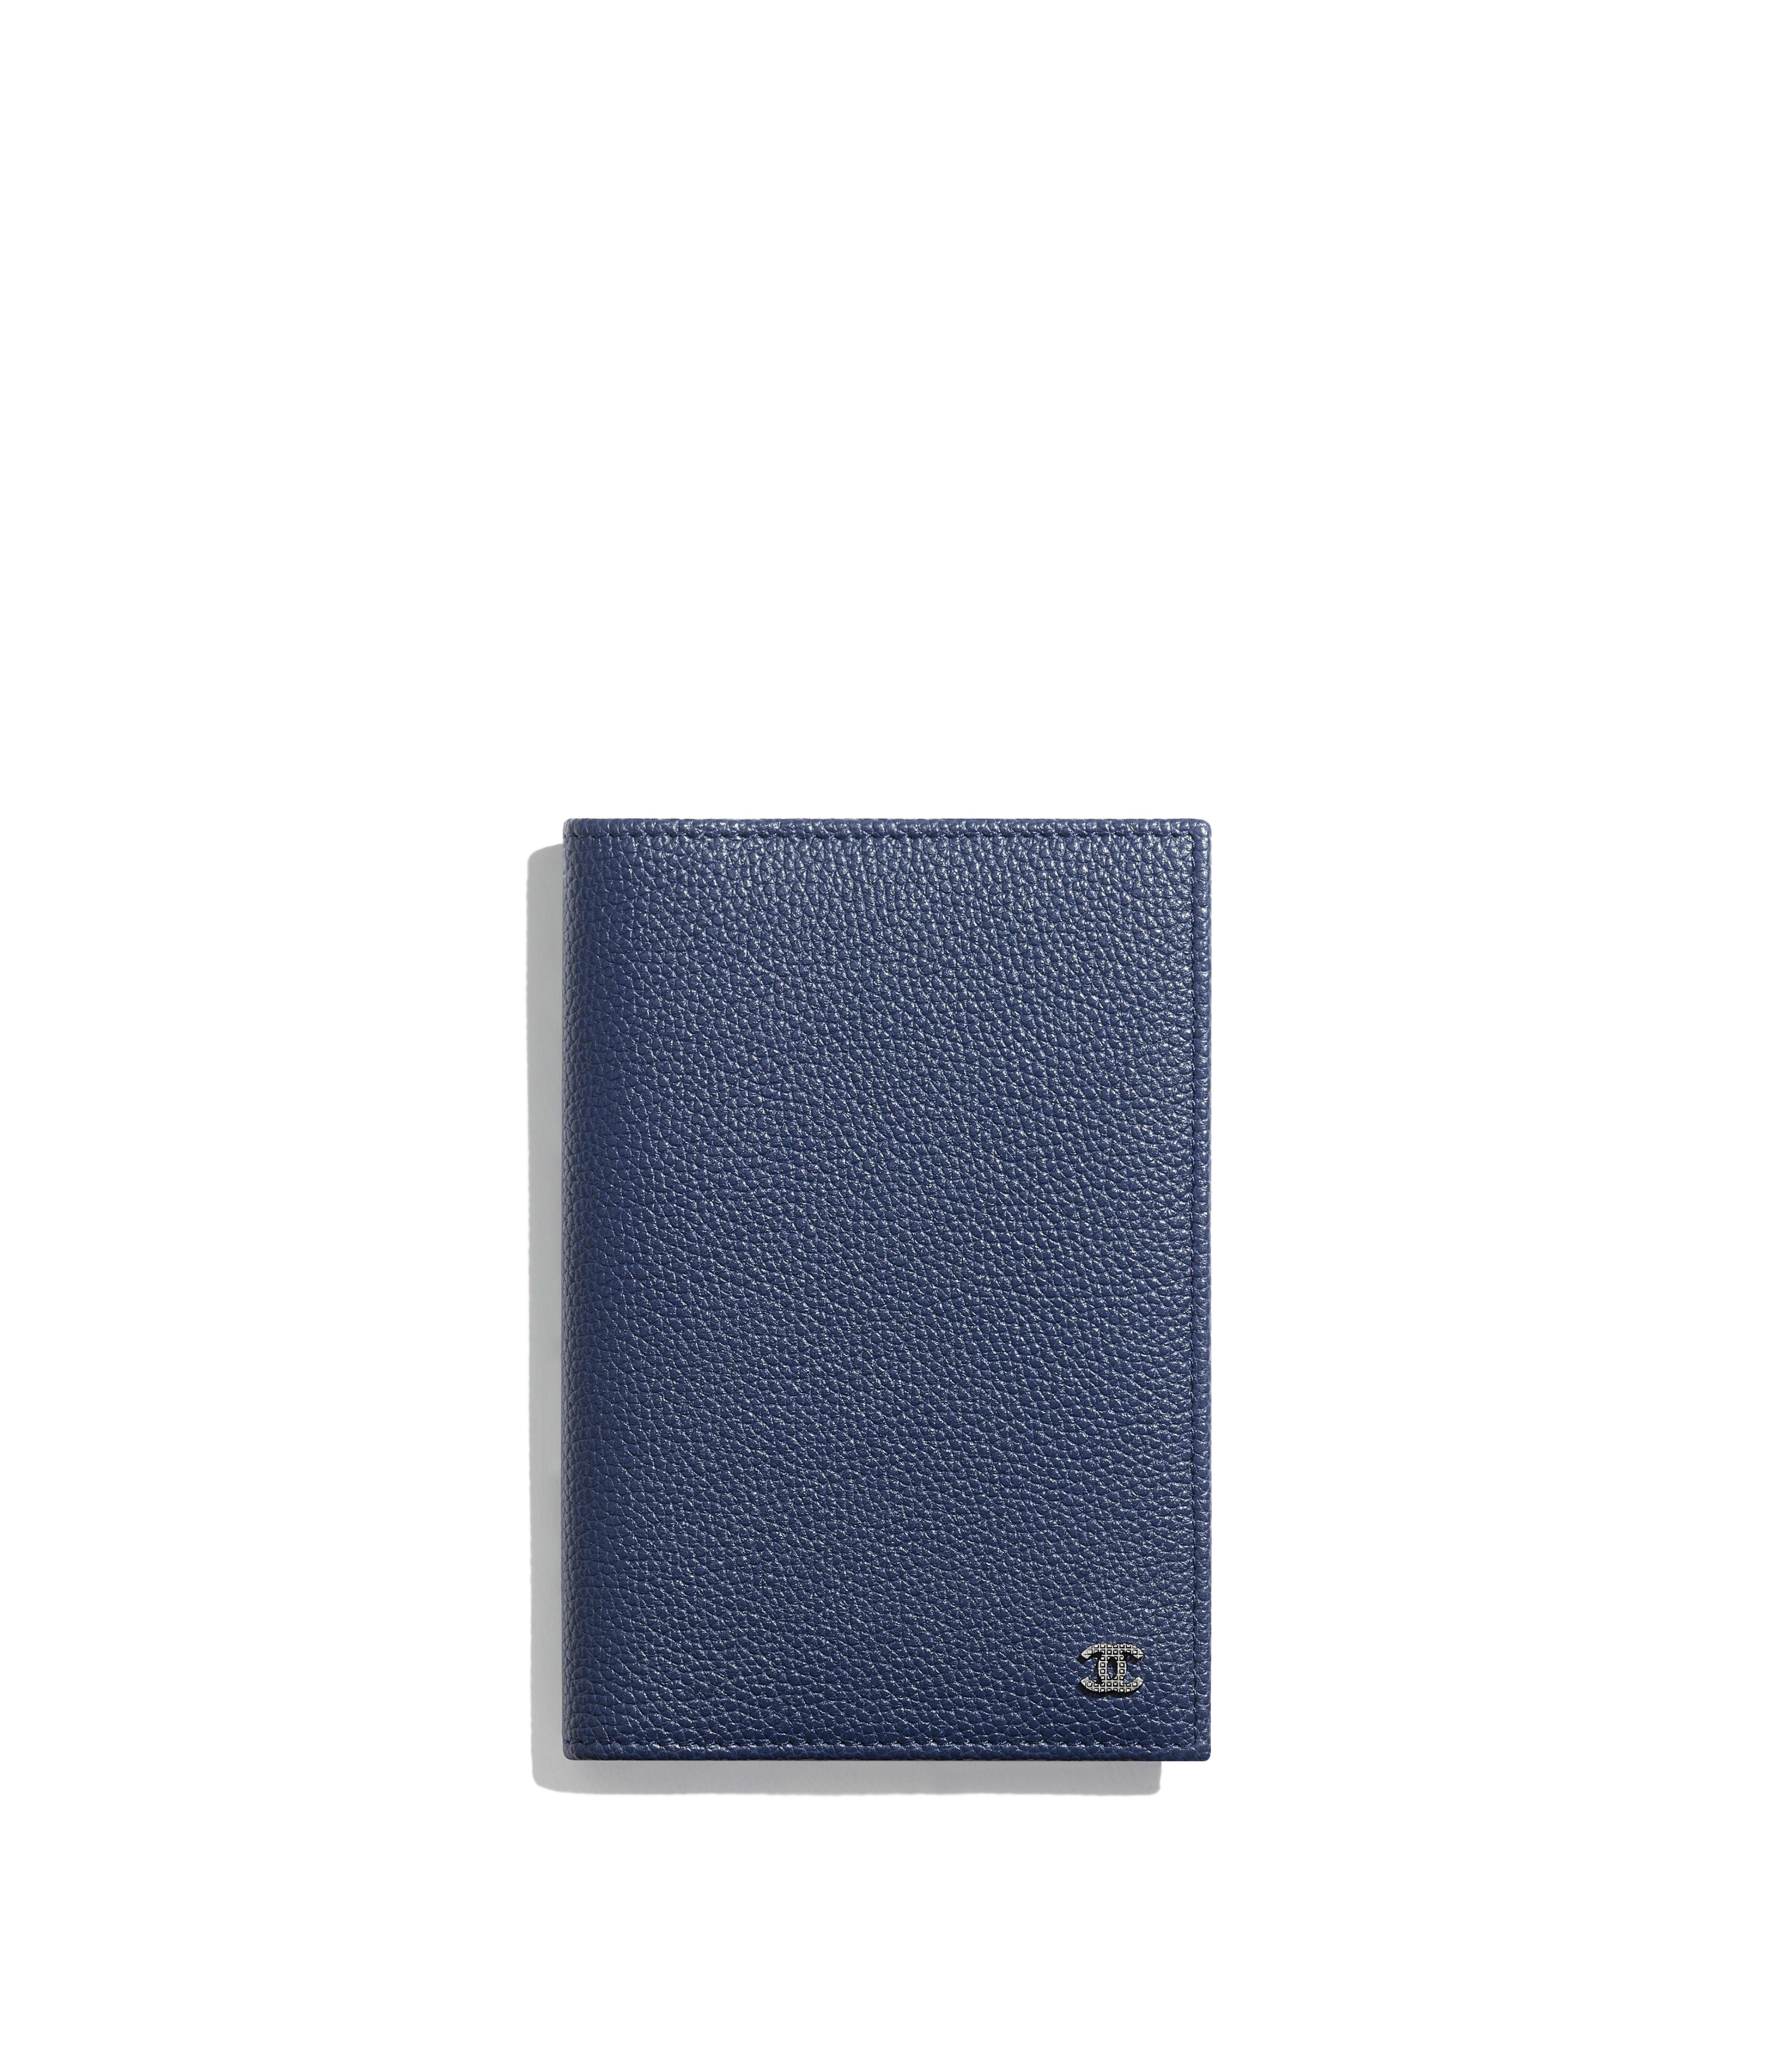 4f15889f83b9 Passport Holder Grained Calfskin & Ruthenium-Finish Metal, Navy Blue Ref.  A81933Y334205B647